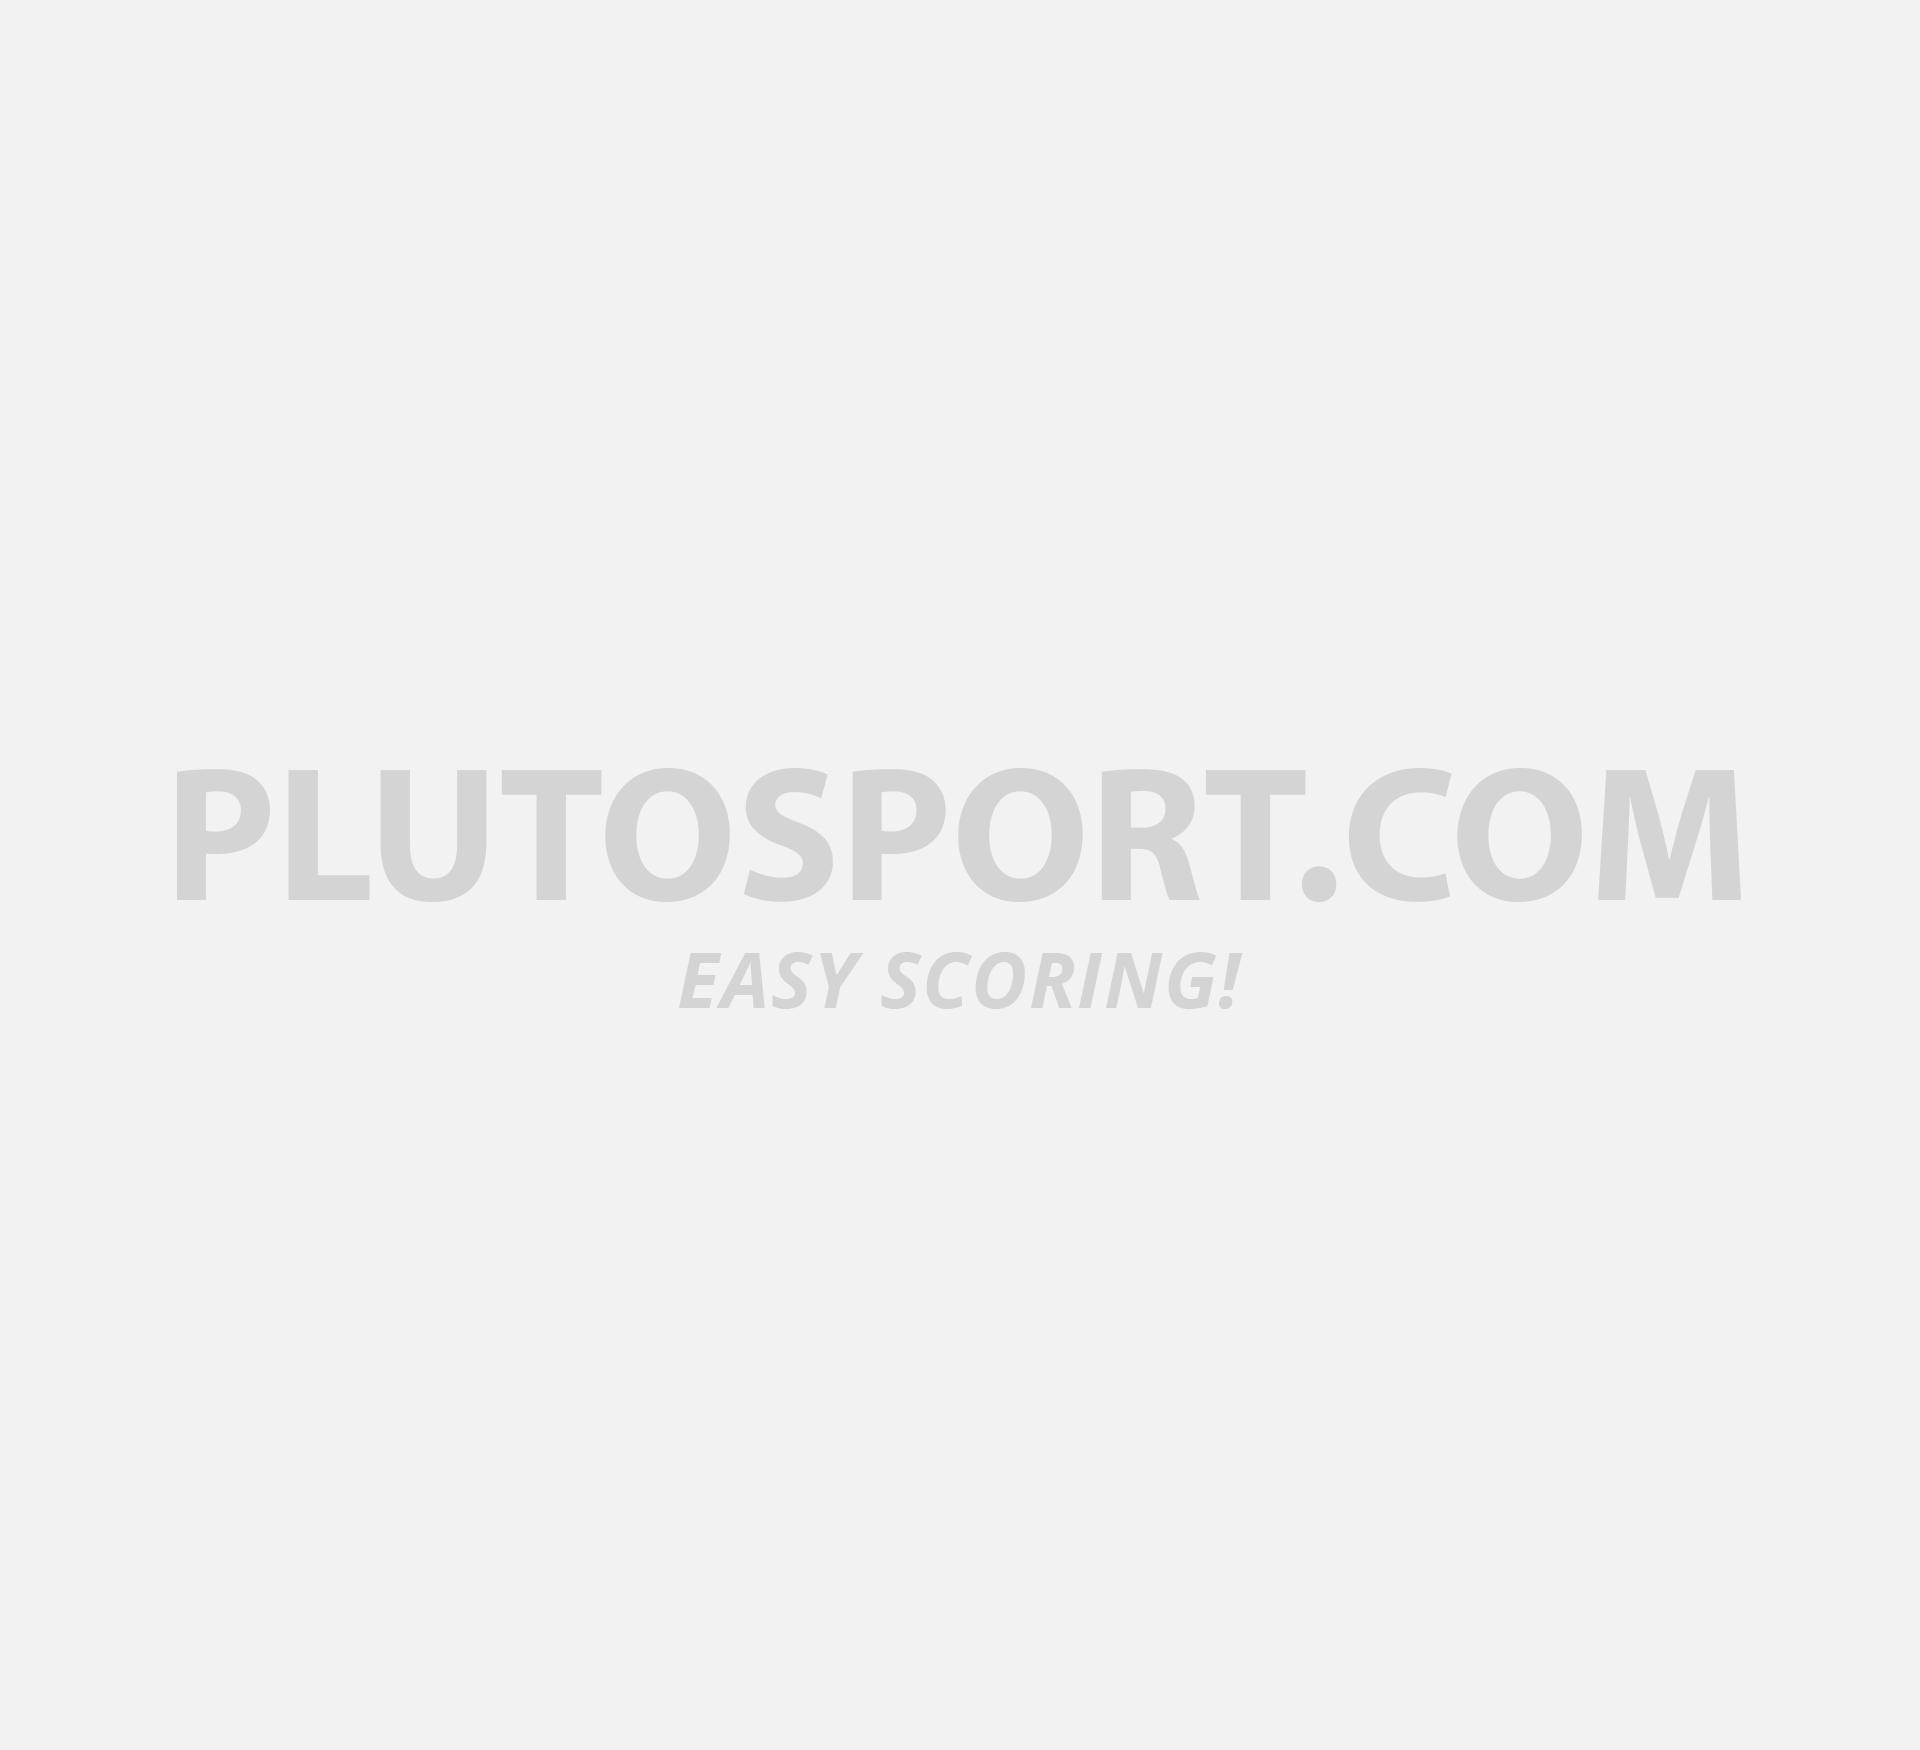 f0af8c4deeda Adidas Tiro Linear Teambag L - With shoe compartment - Bags - Football -  Teamwear Shop - Sports